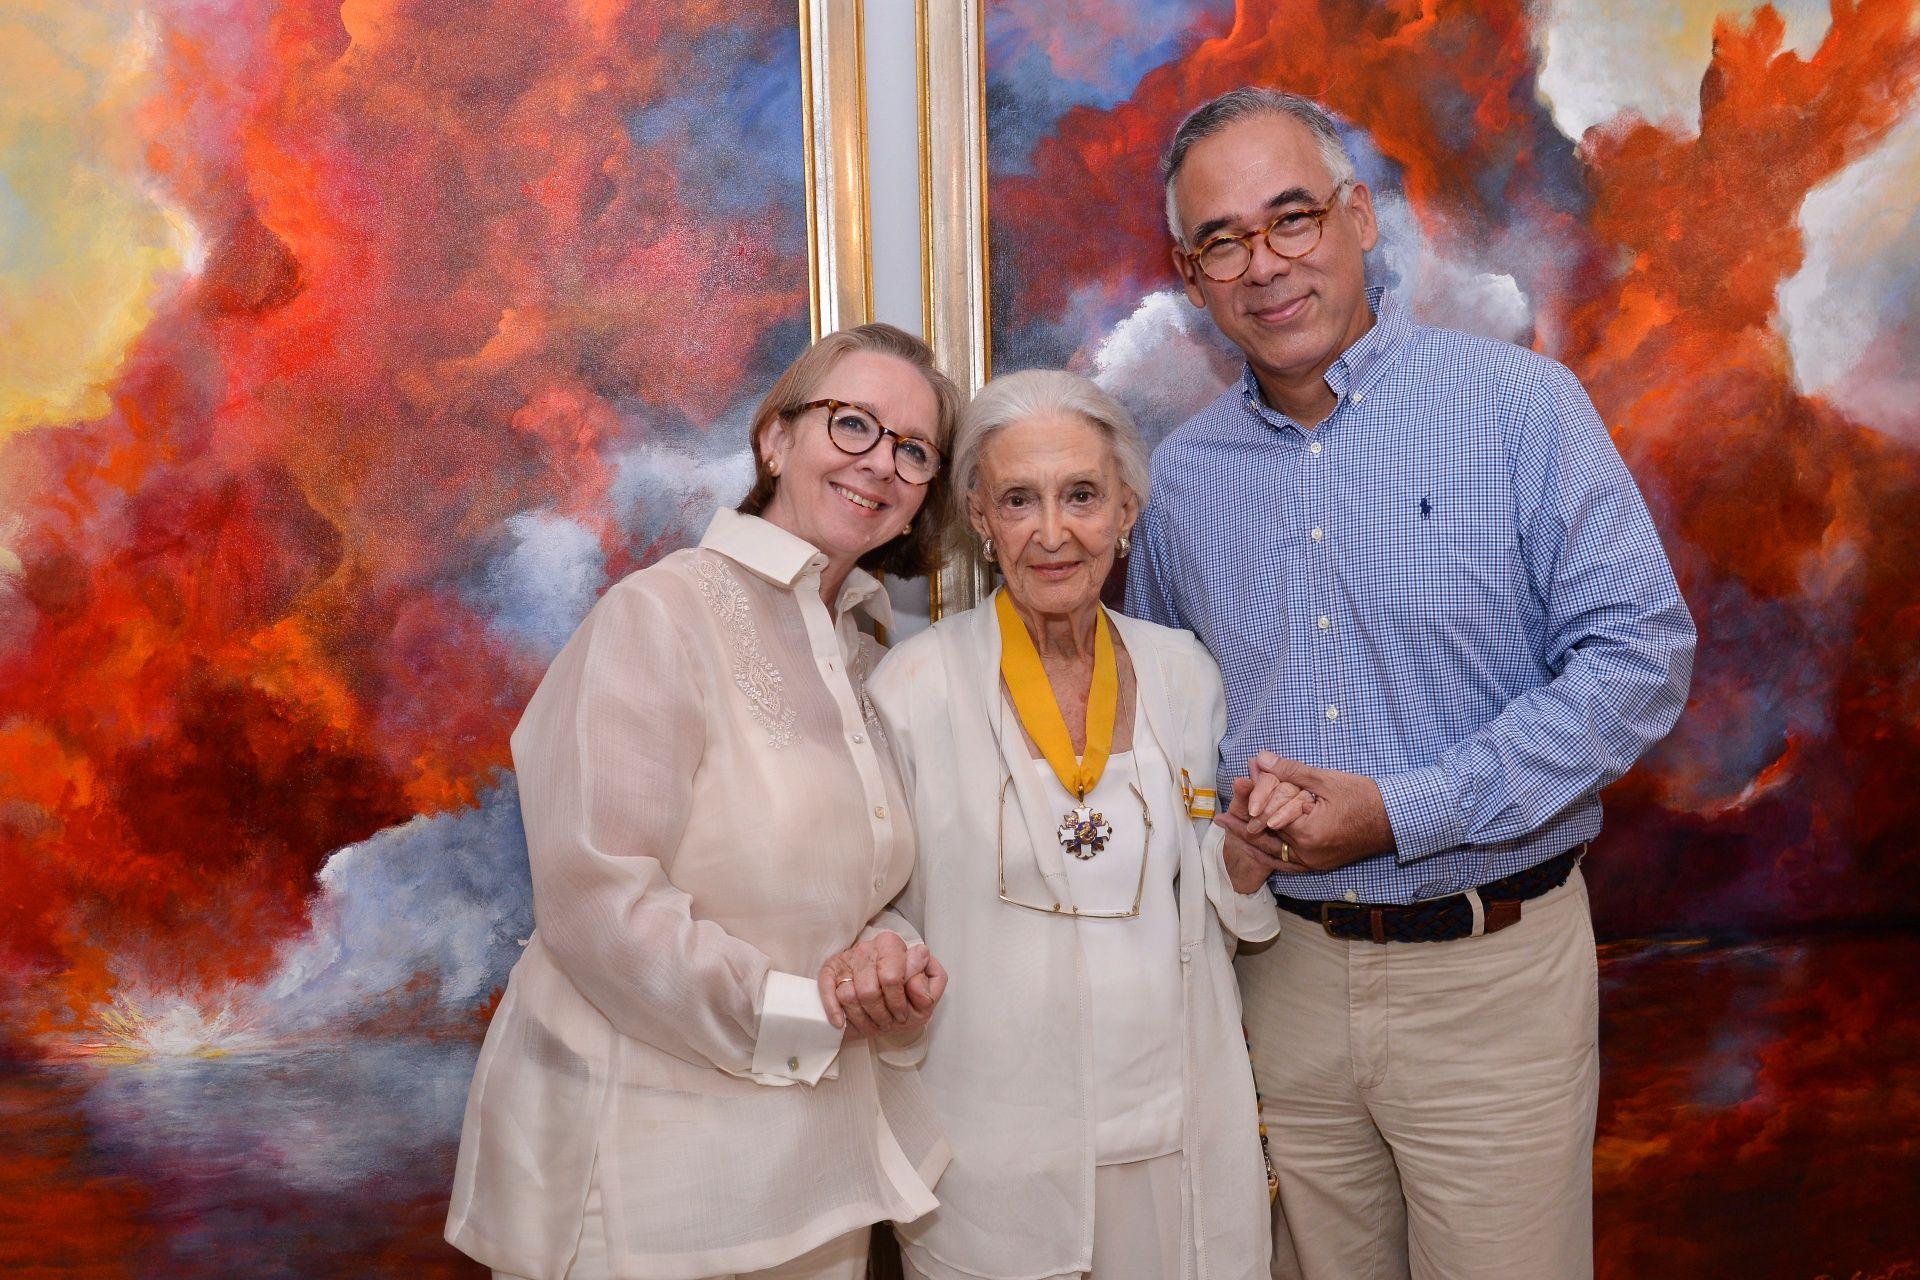 Denise Weldon-Minana, Betsy Westendorp, and Architect Manny Minana